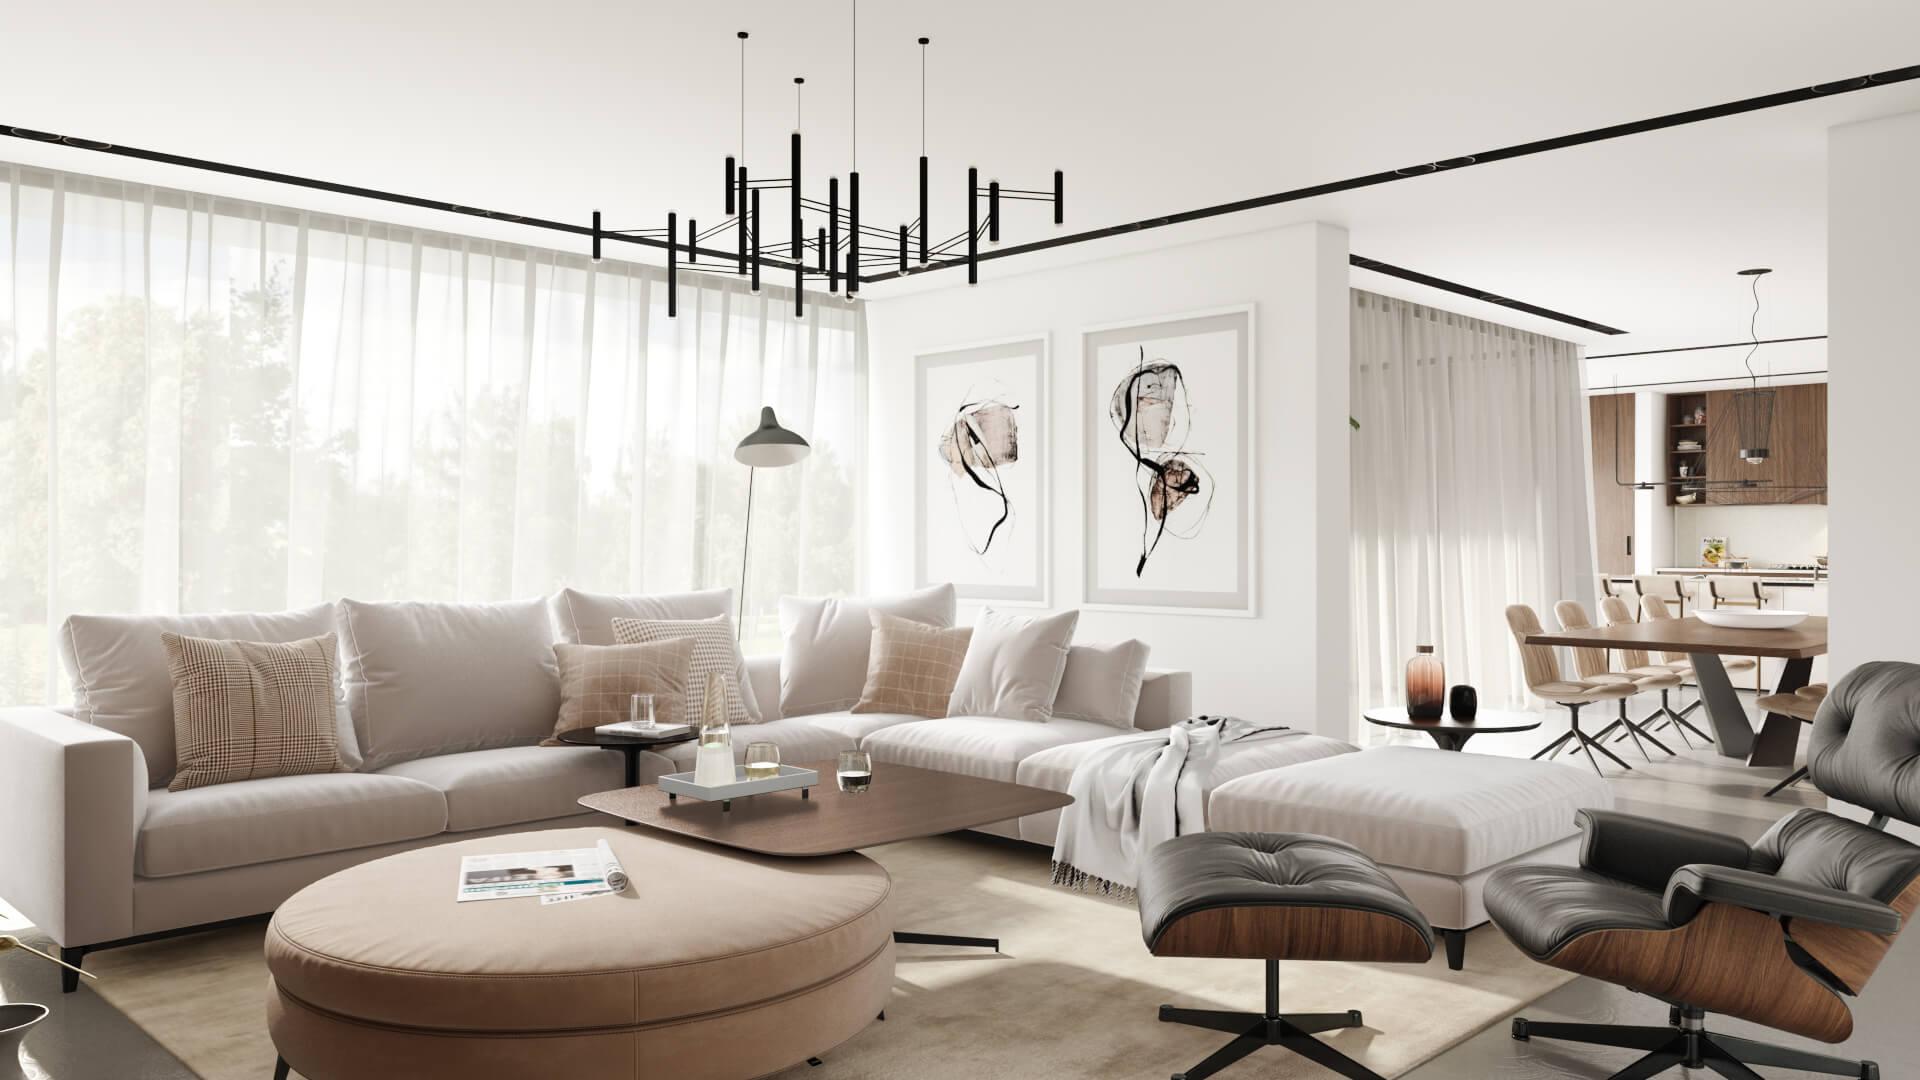 Furniture Magazine for a Living Area CGI